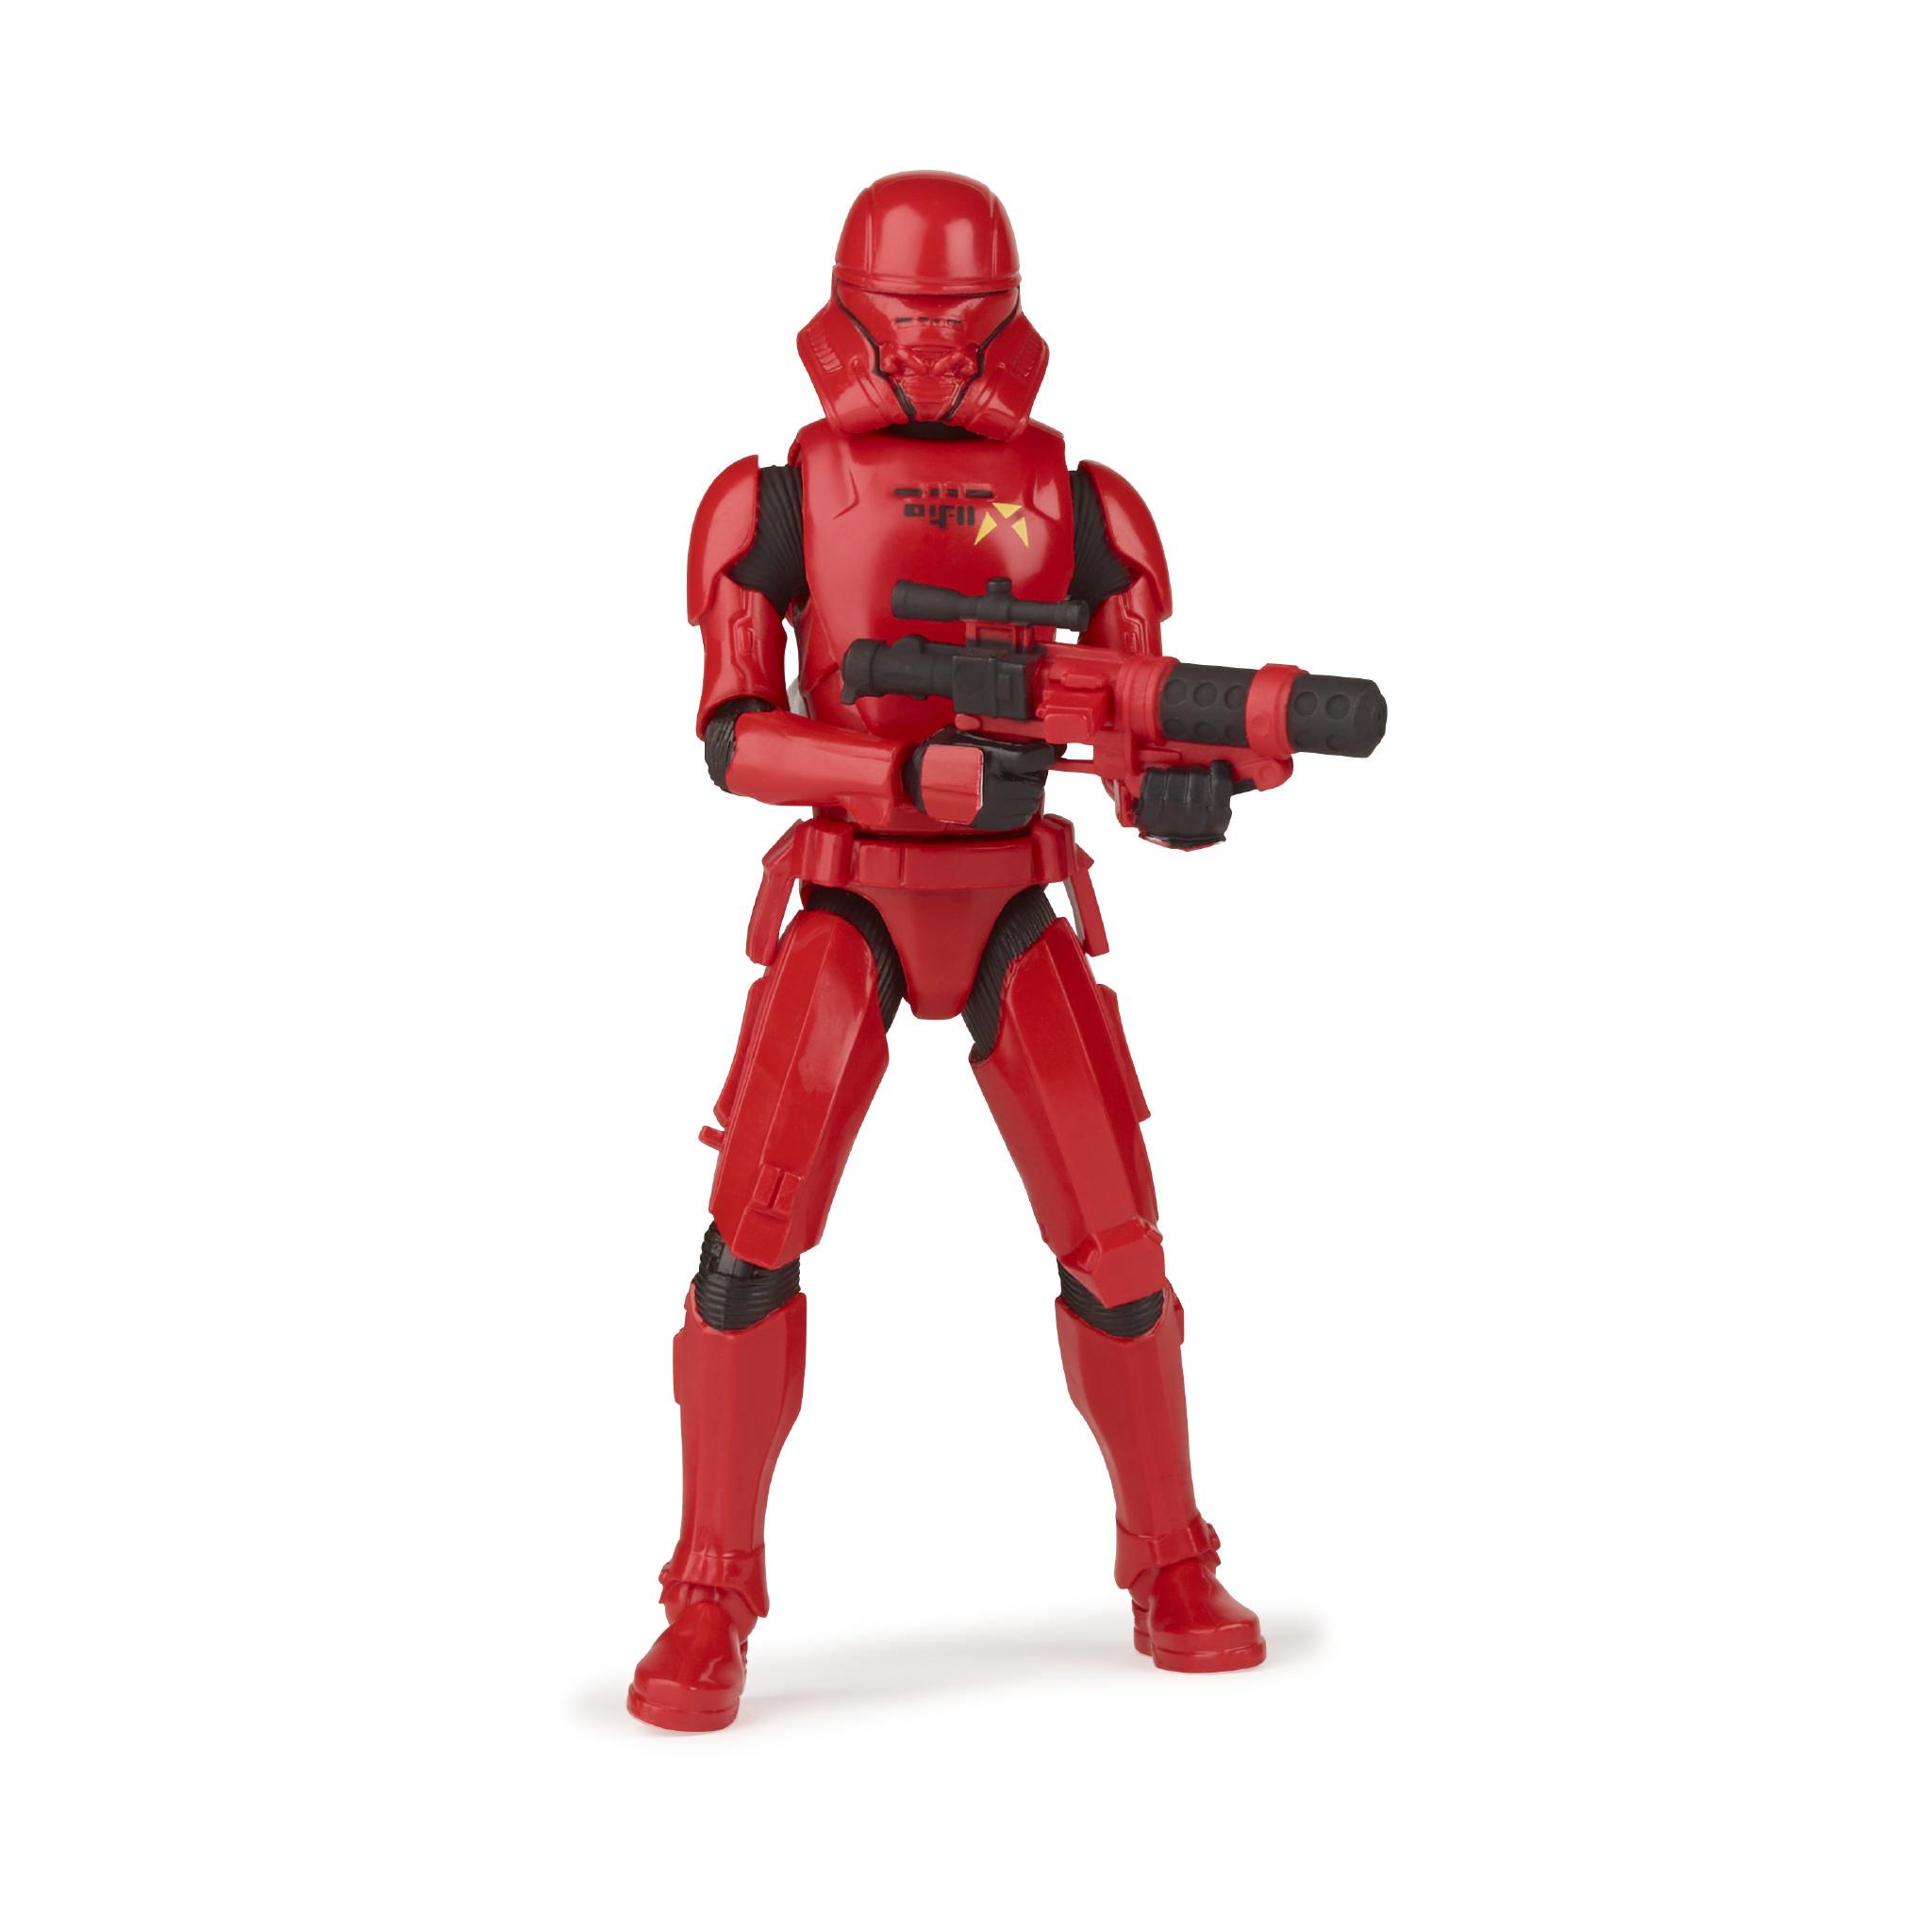 SWGOA (TROS) First Order Sith Jet Trooper Figure 4